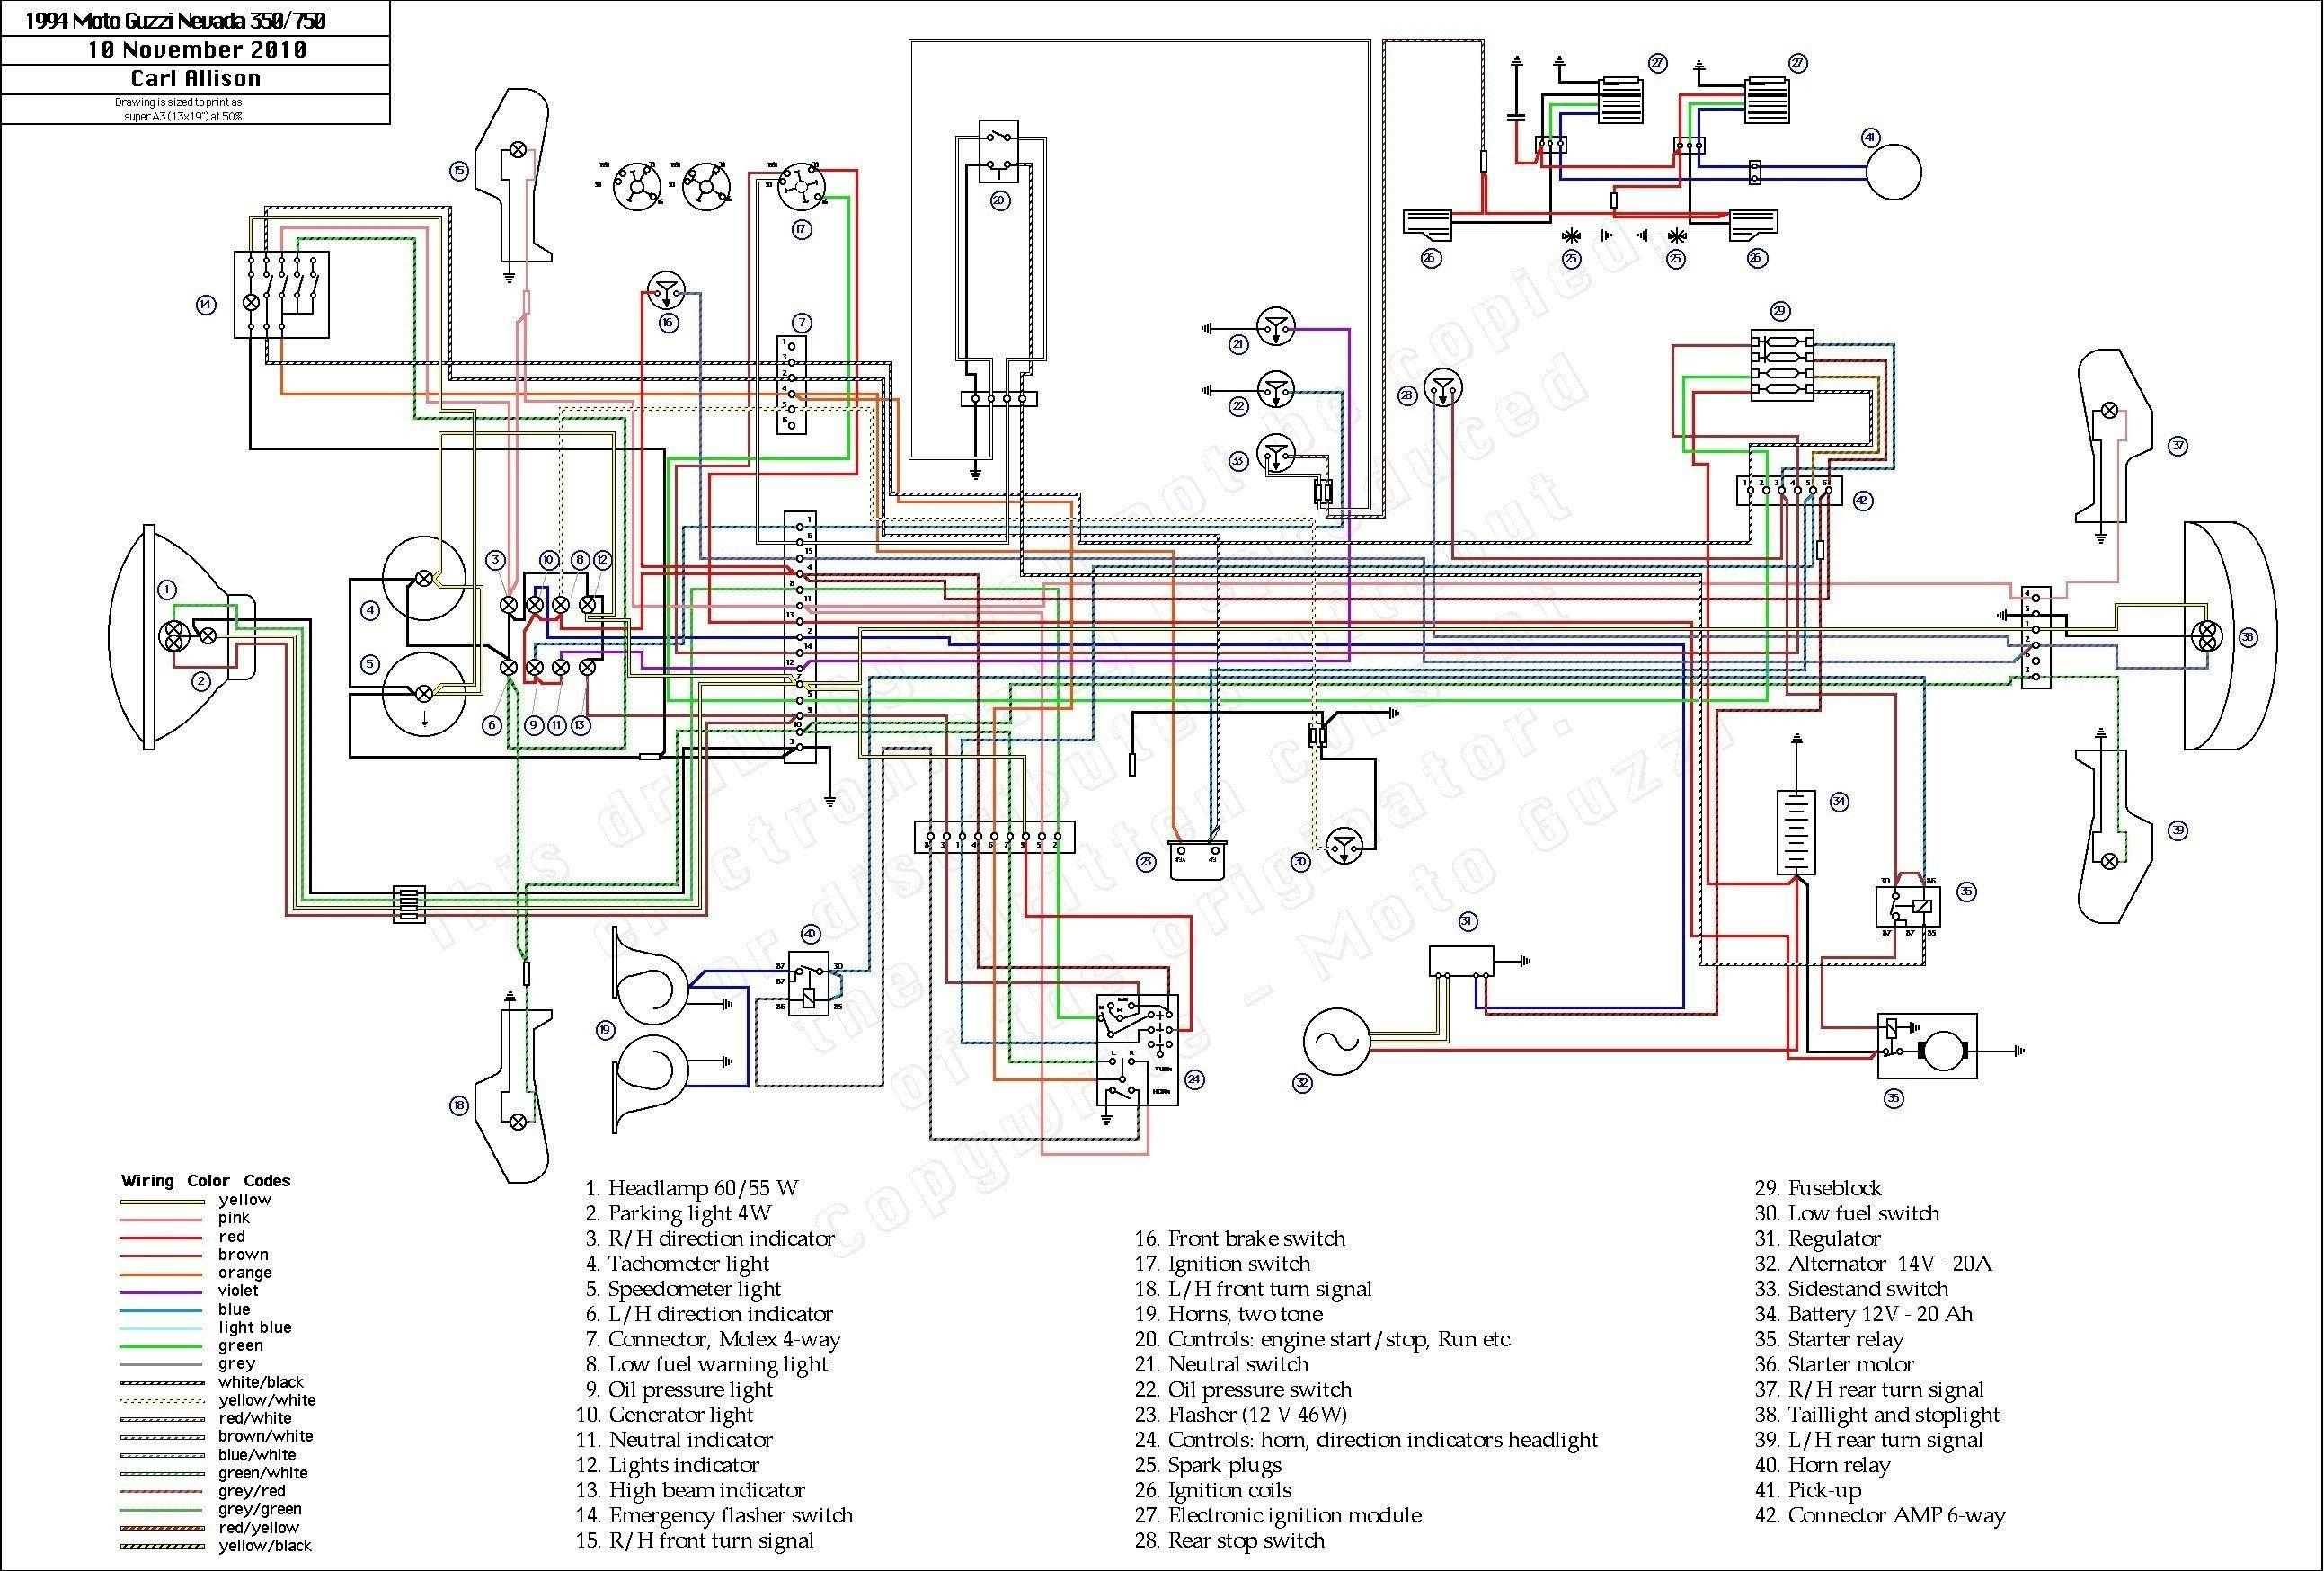 Pin Oleh Margaret M Wheeler Di Electrical Wiring Diagram Motor Yamaha